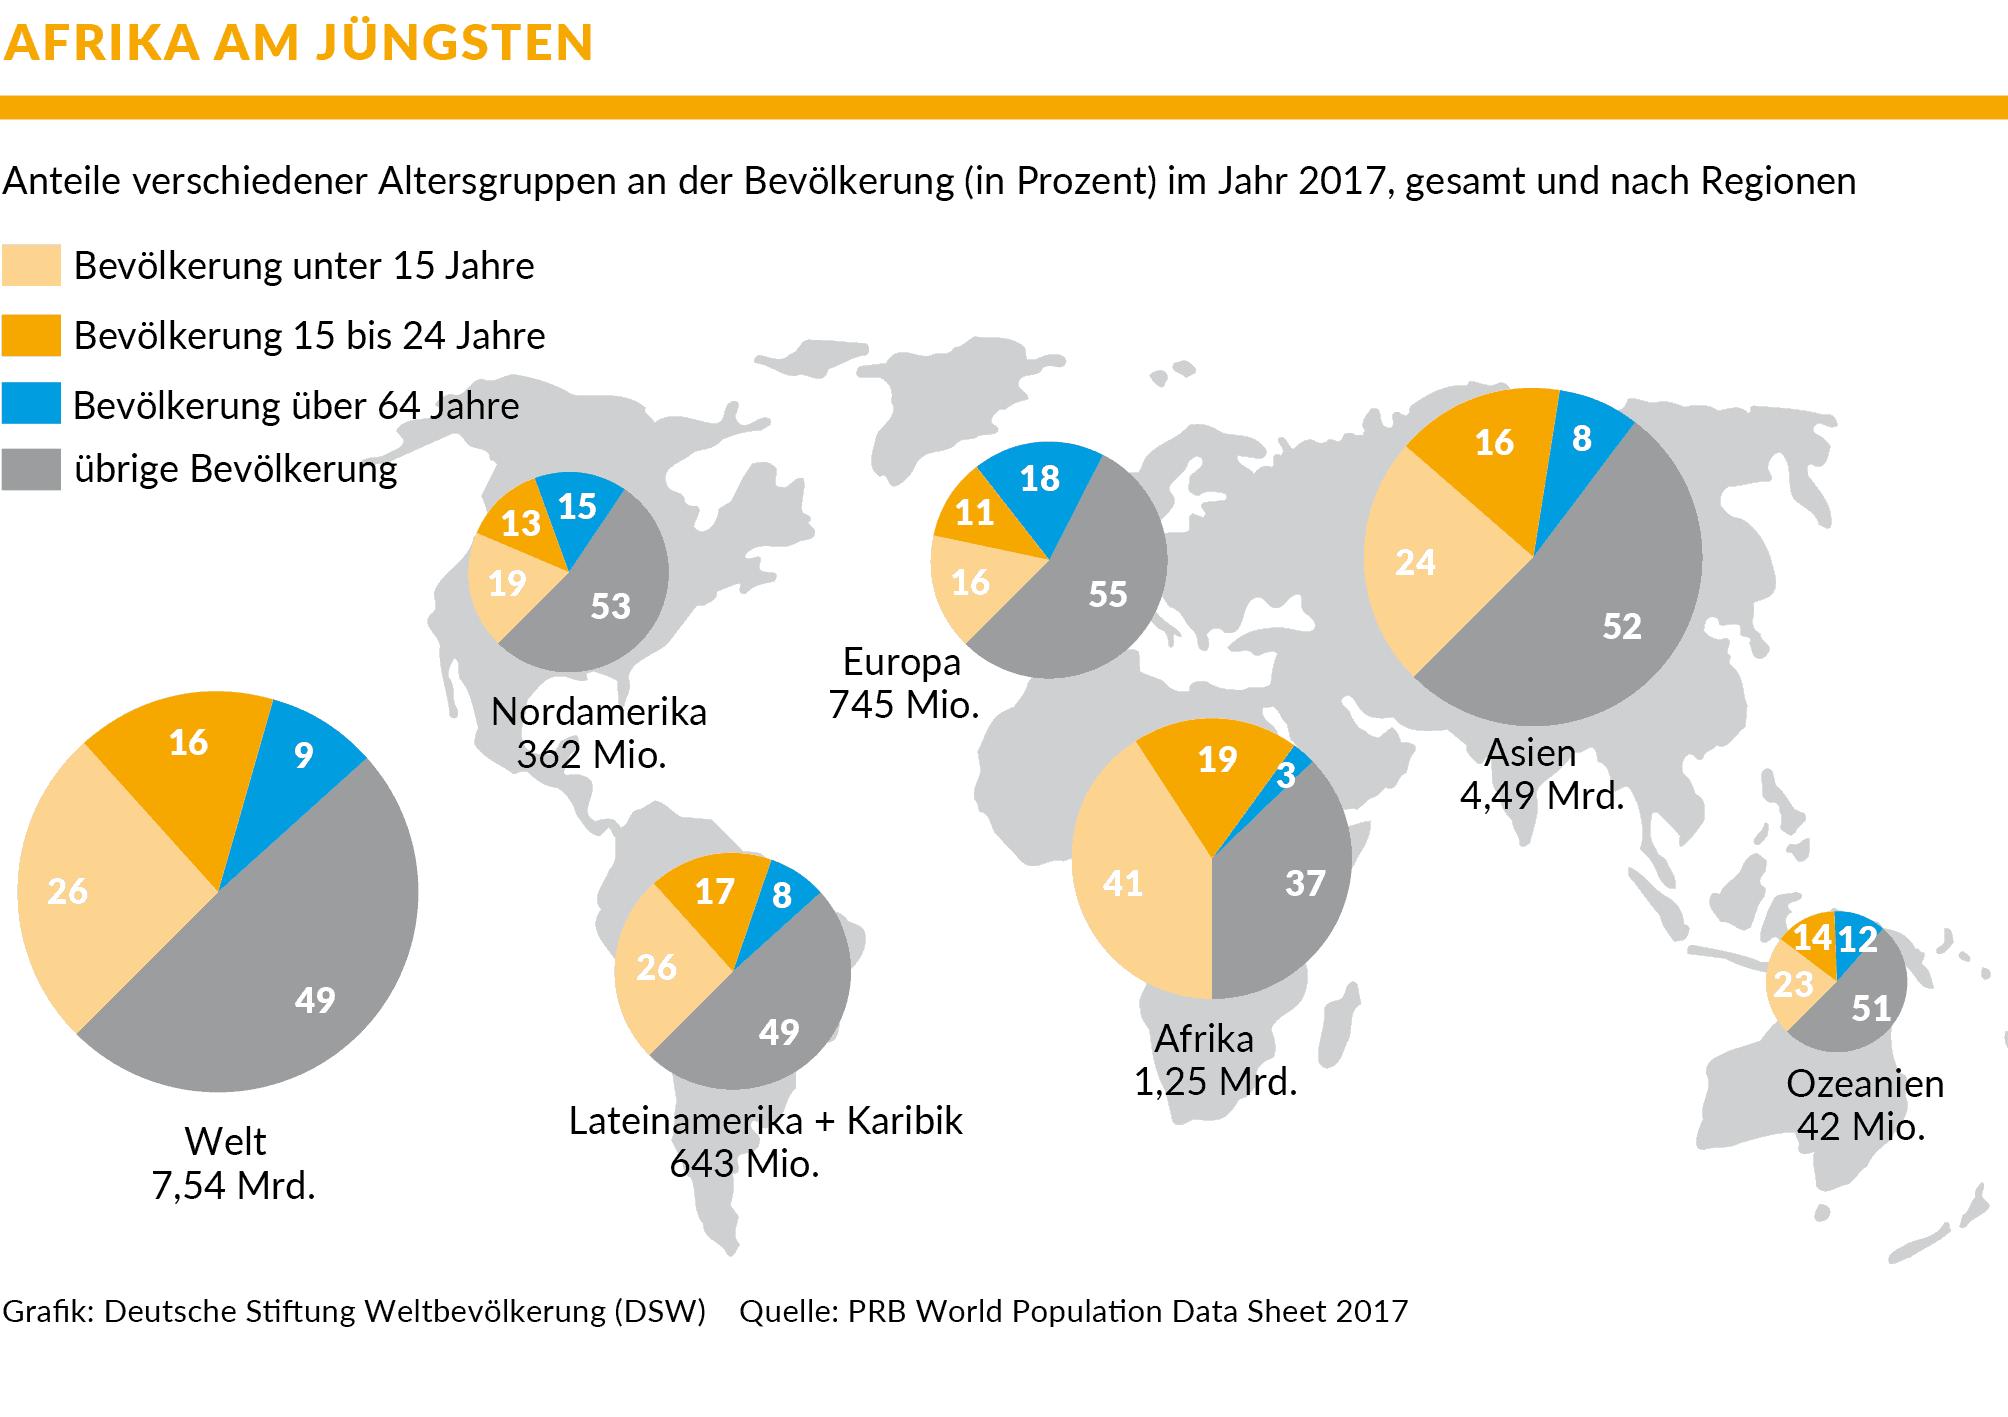 Grafik zur Altersstruktur der Weltbevölkerung